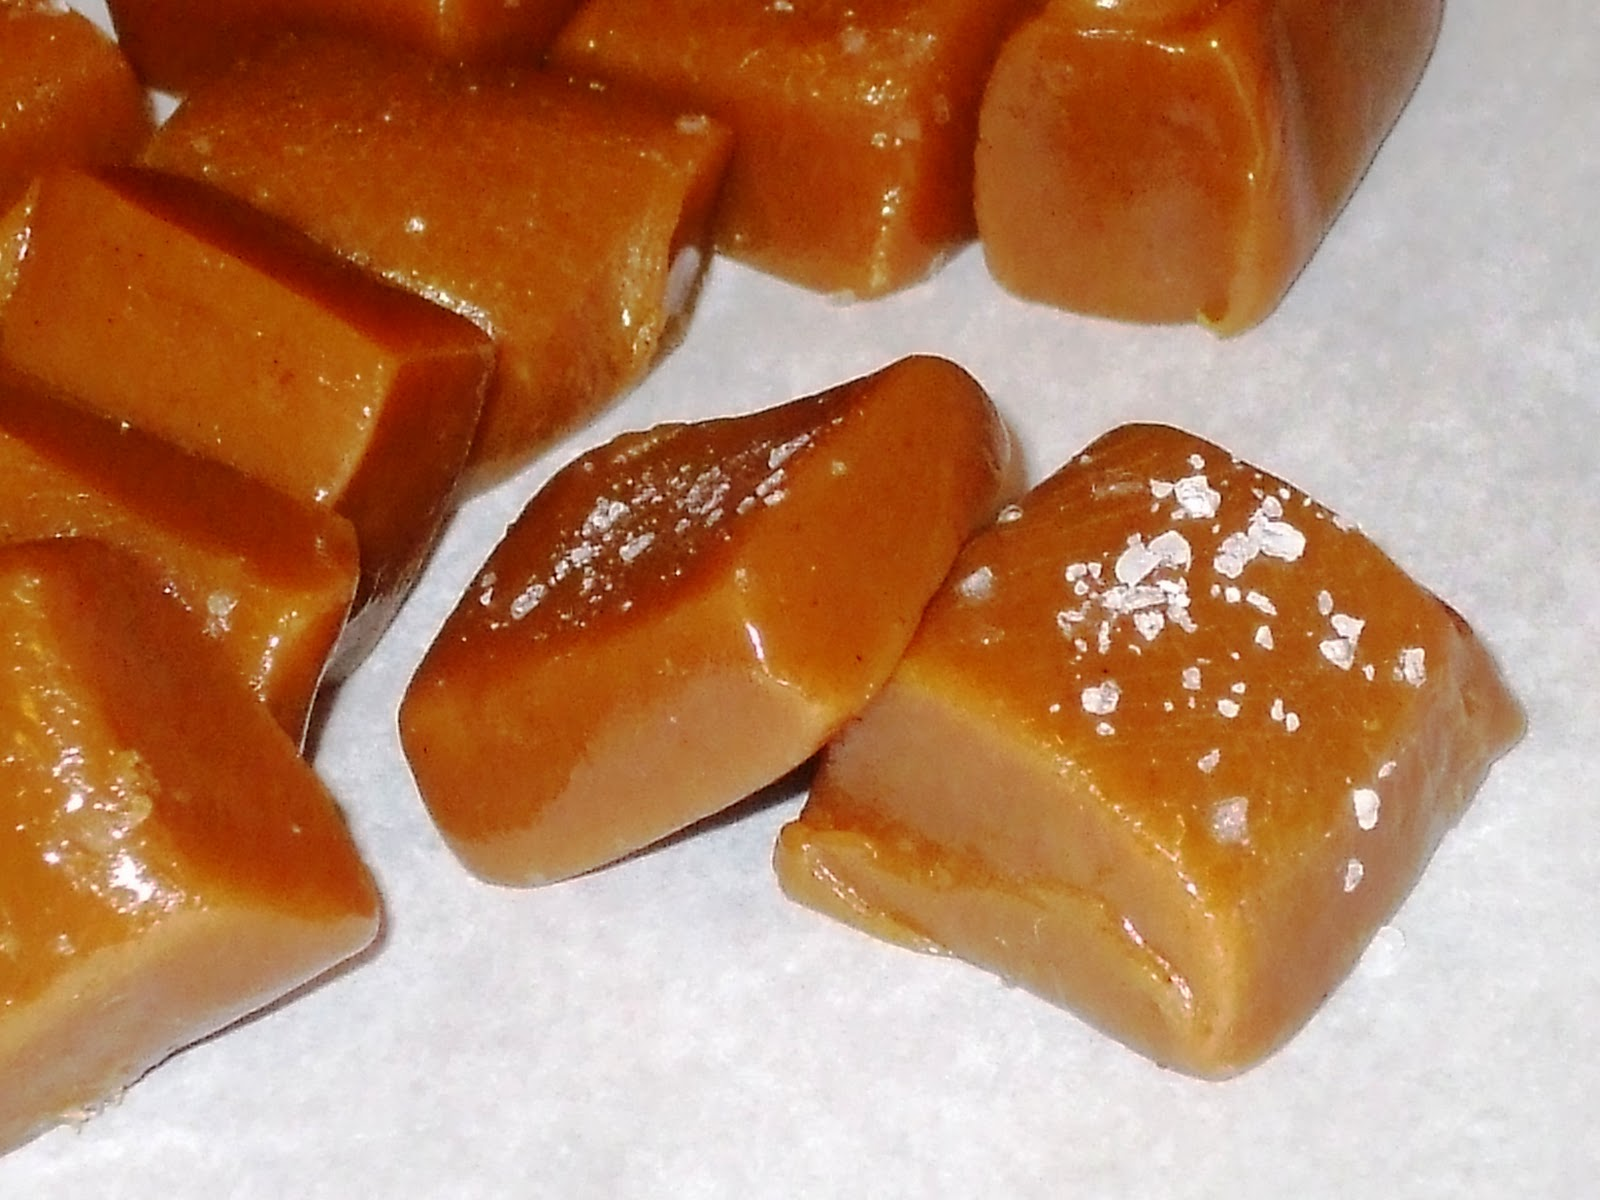 Sinful Sundays: Vanilla Sea Salt Caramel Candy